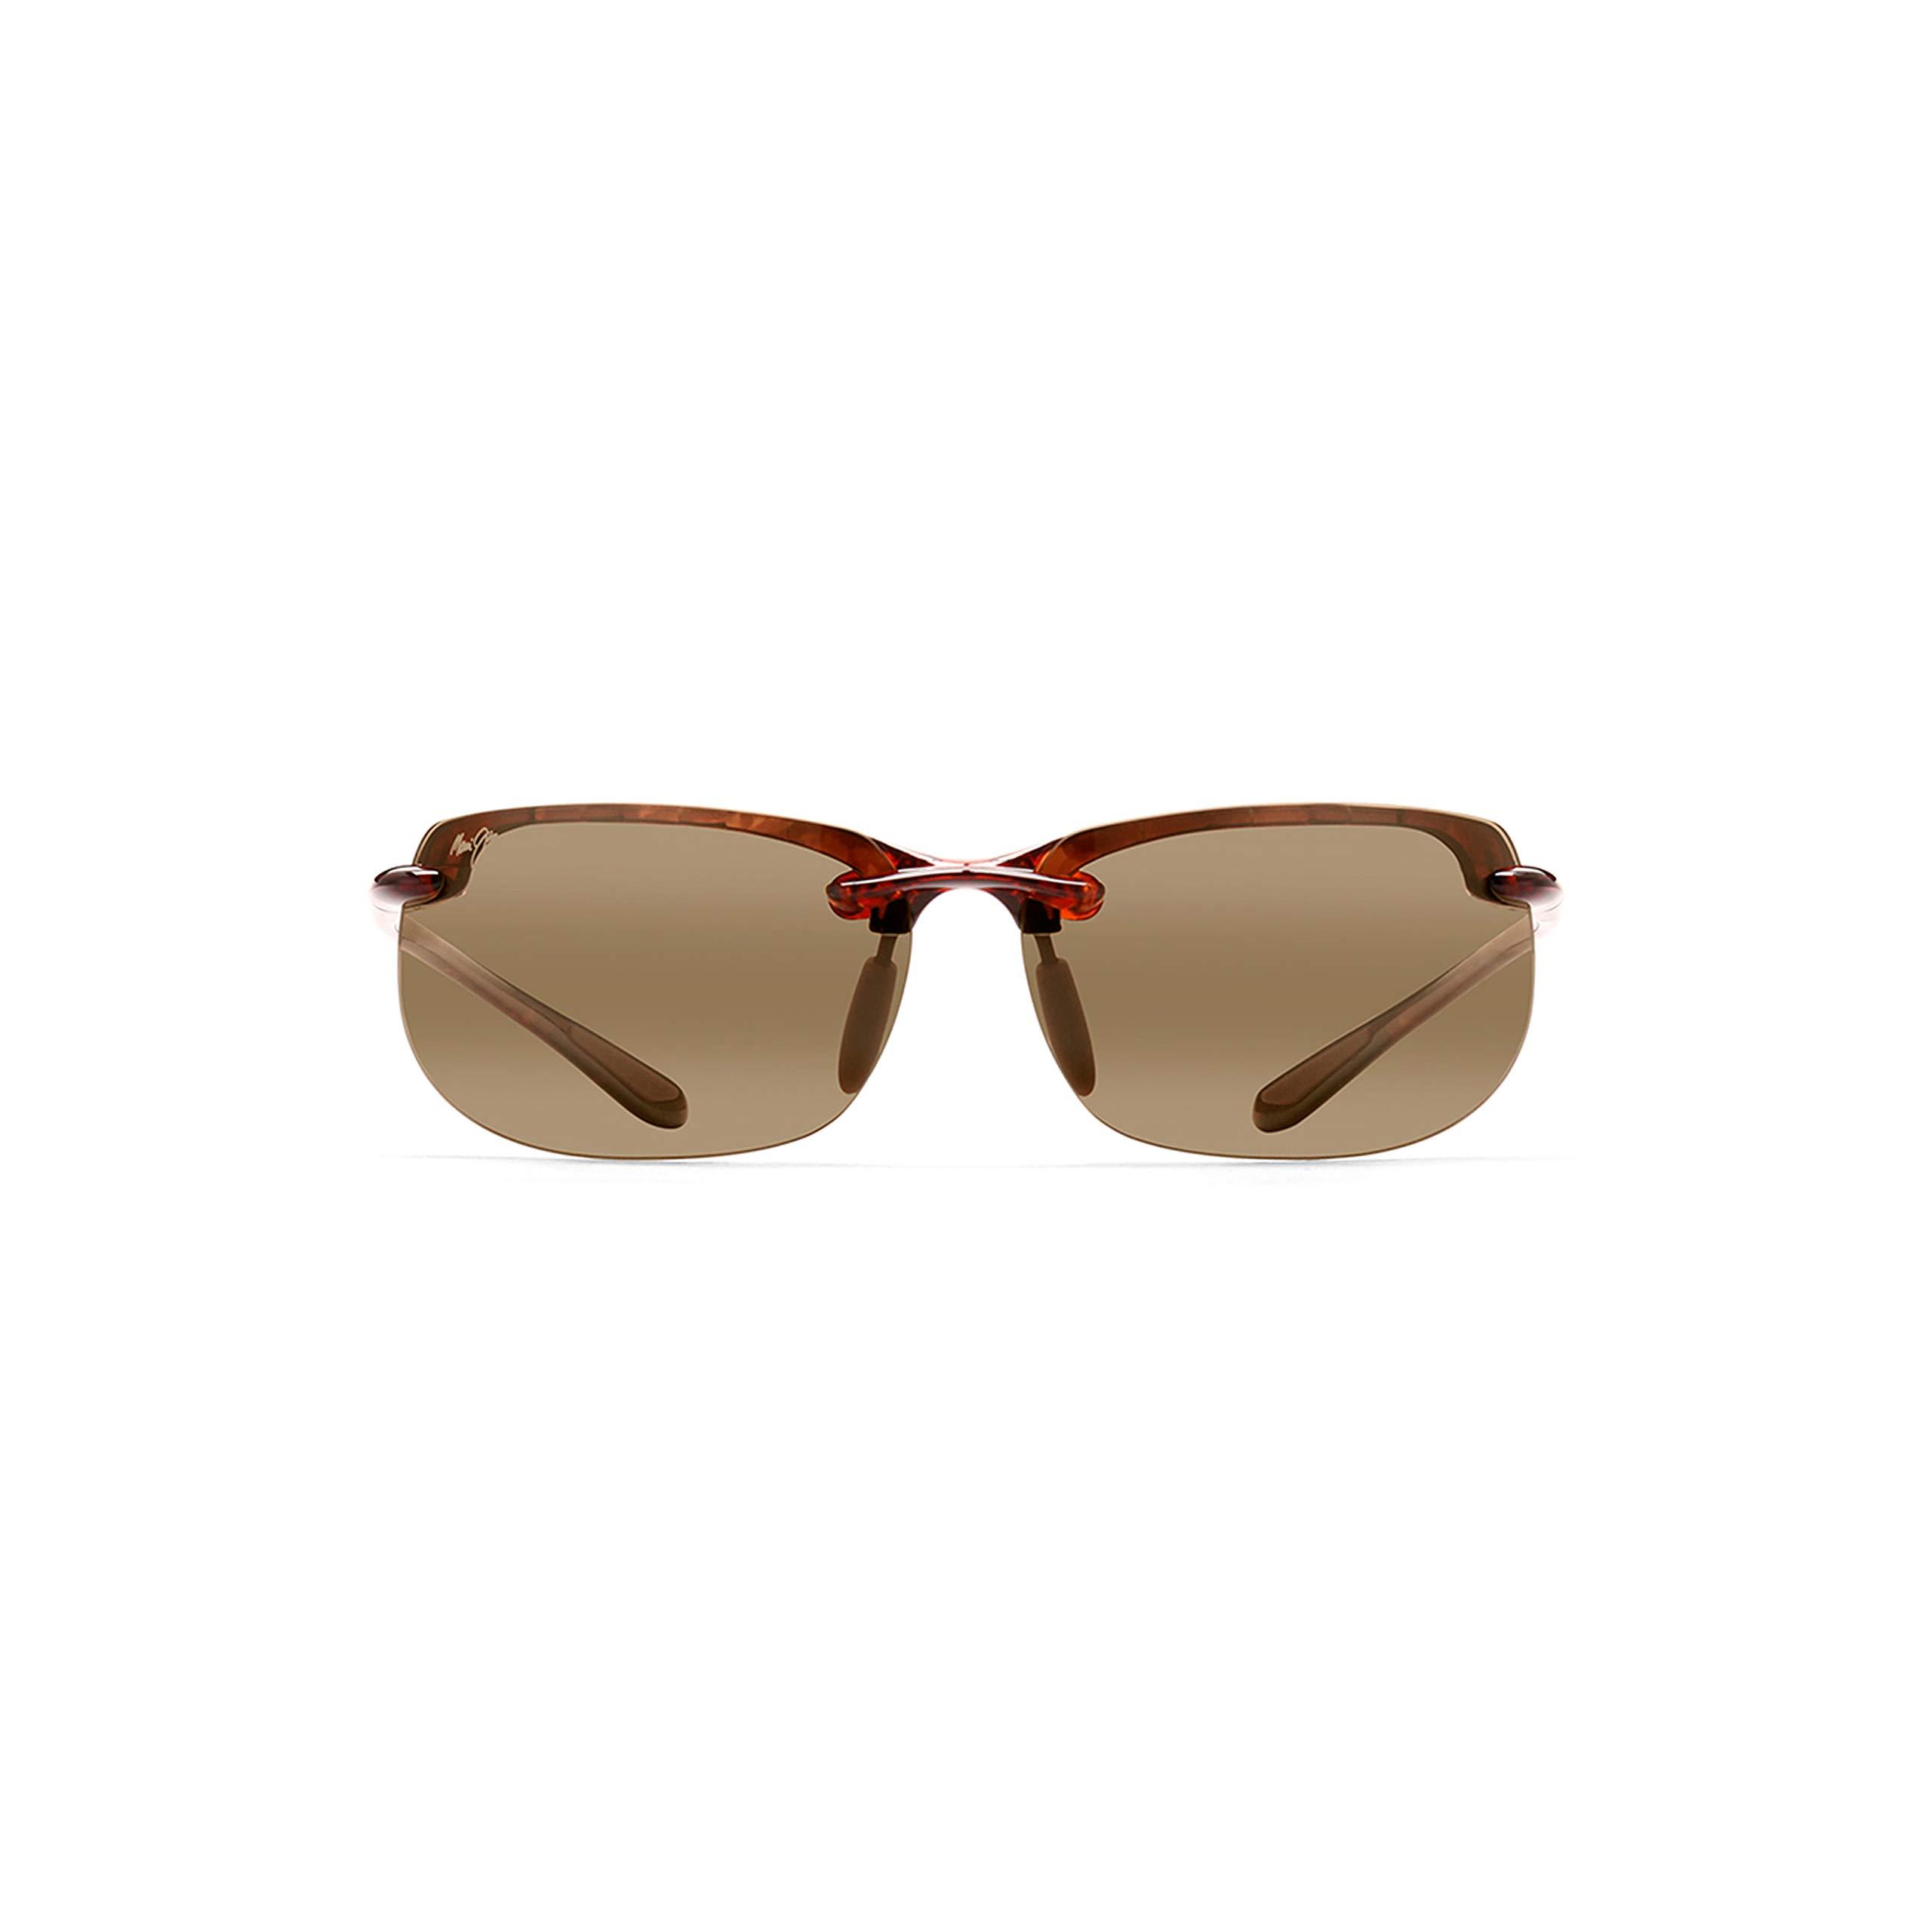 Maui Jim Sunglasses | Banyans H412-10 |, HCL Bronze Lenses, with Patented PolarizedPlus2 Lens Technology by Maui Jim